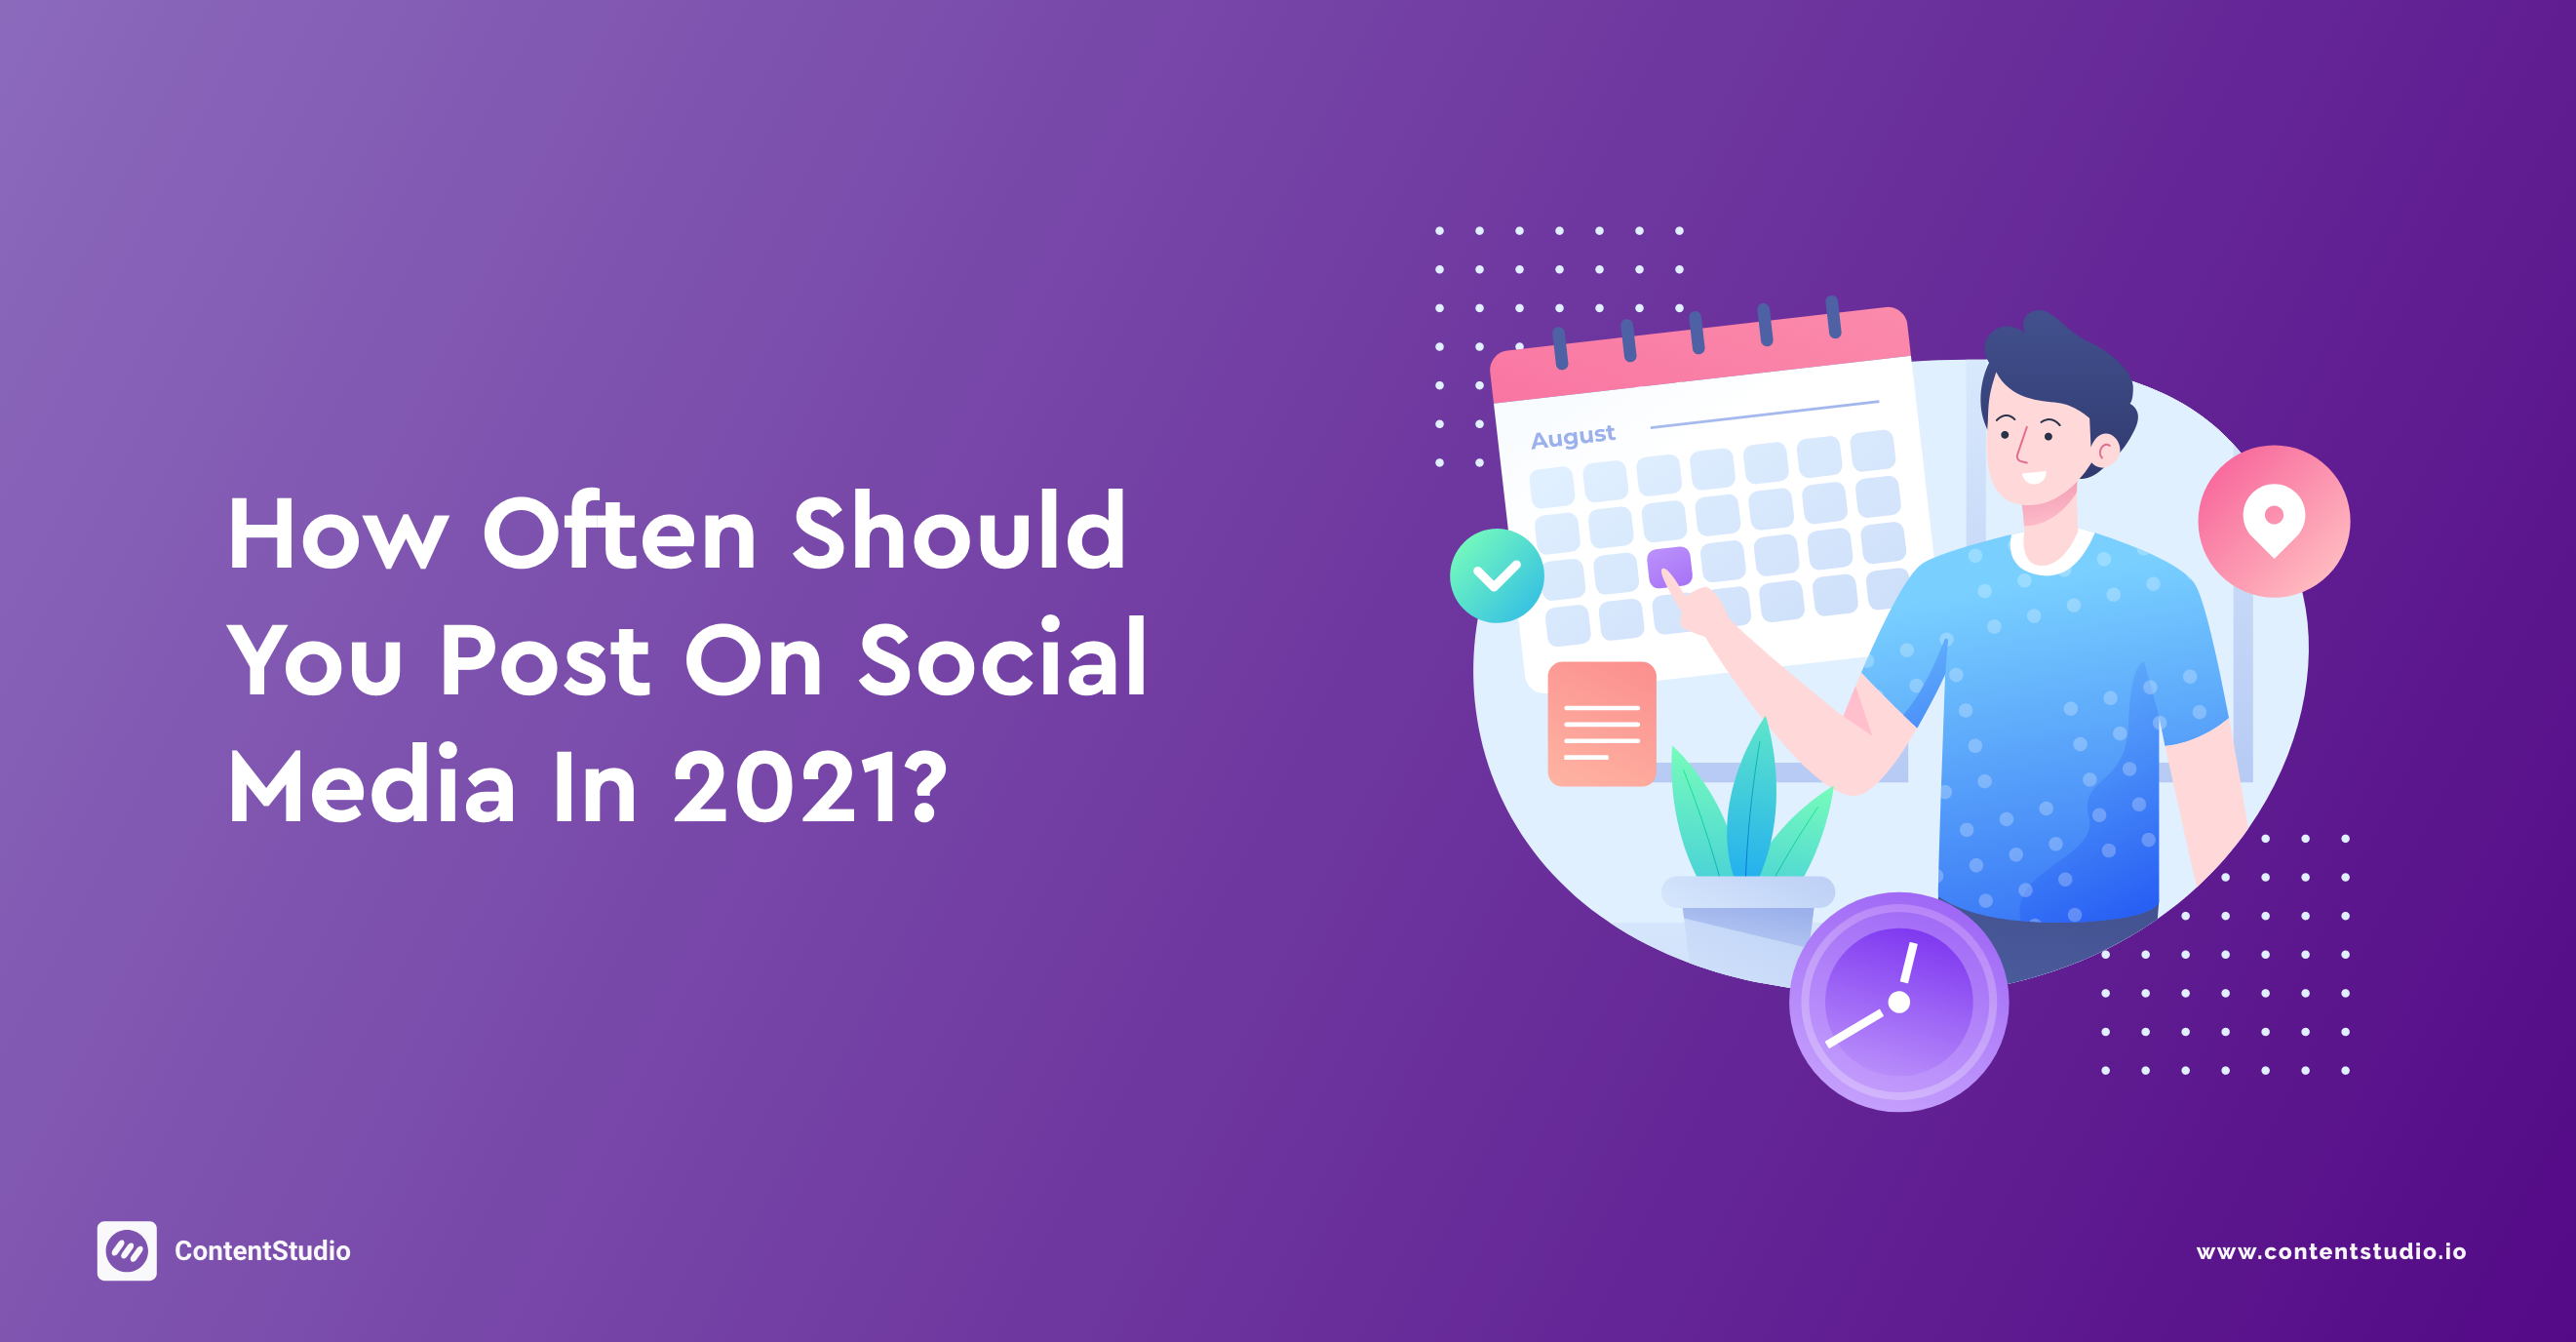 How Often Should You Post on Social Media